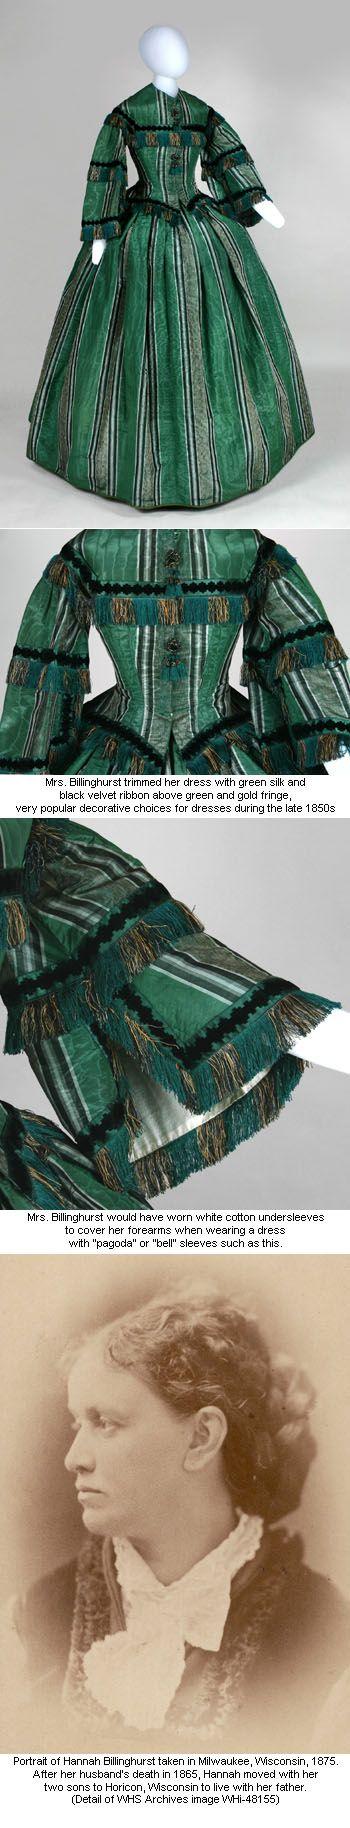 Promenade dress worn by Hannah  Billinghurst of Juneau, Wisconsin, 1857: Civil War